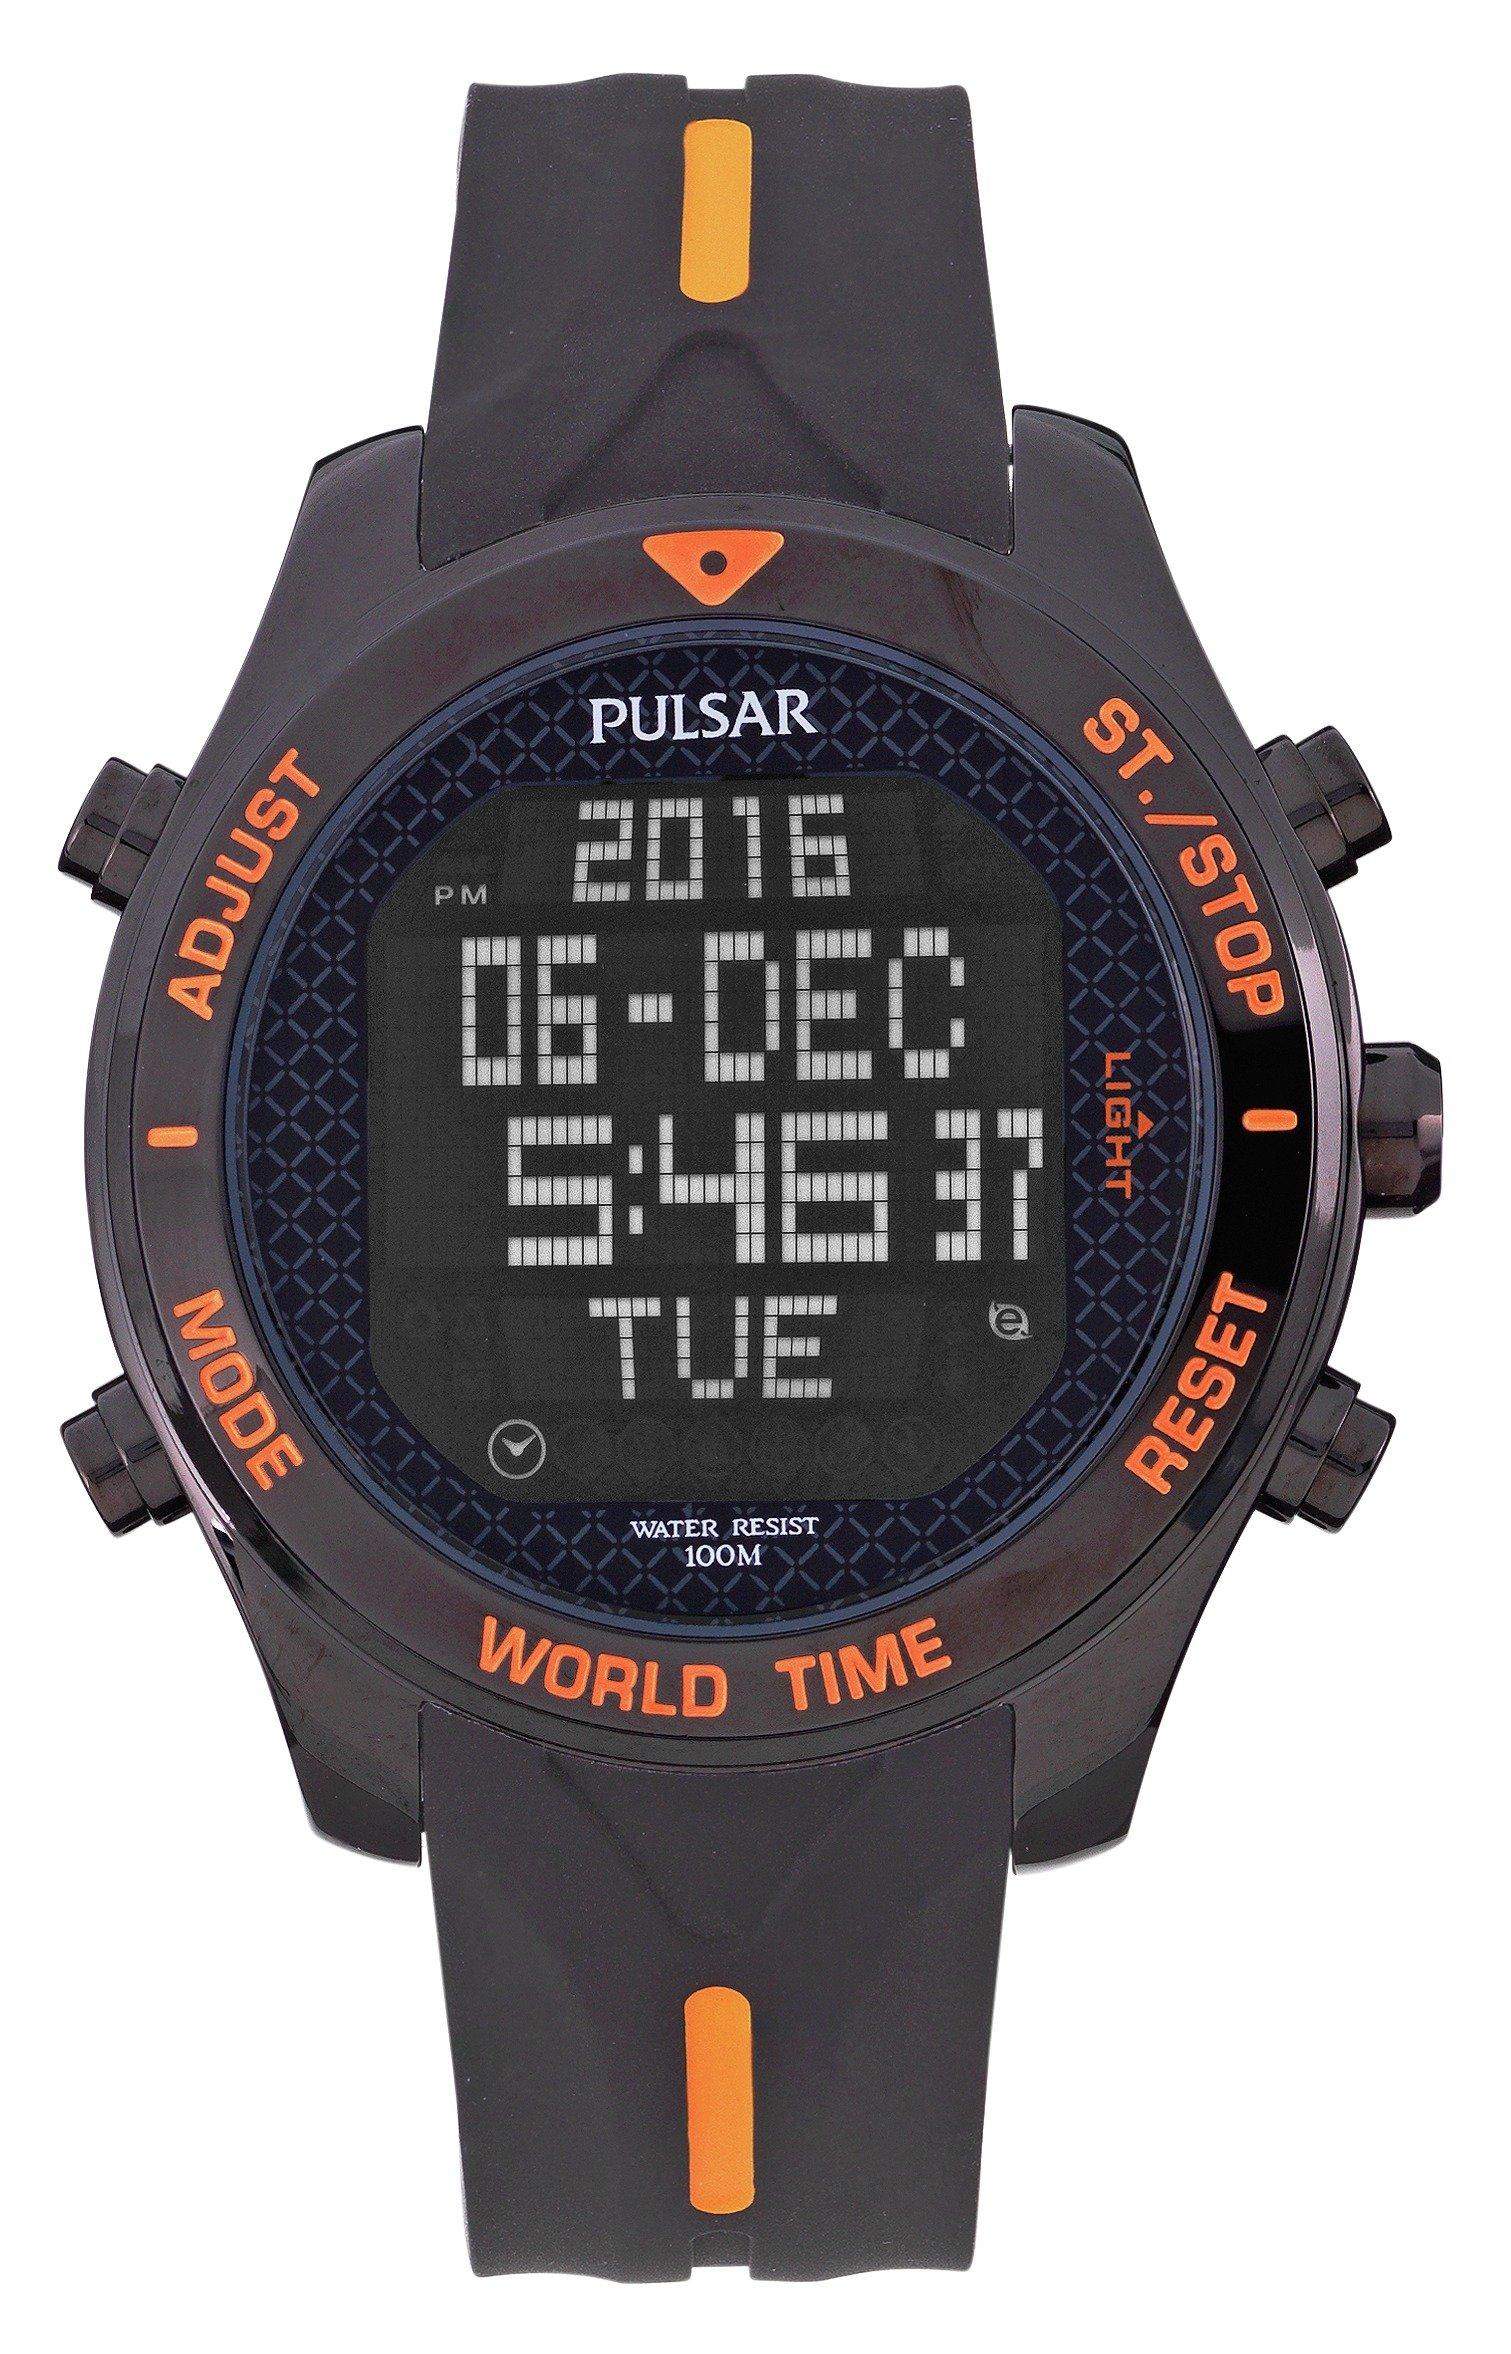 Pulsar Men's Black Stainless Steel Digital Watch